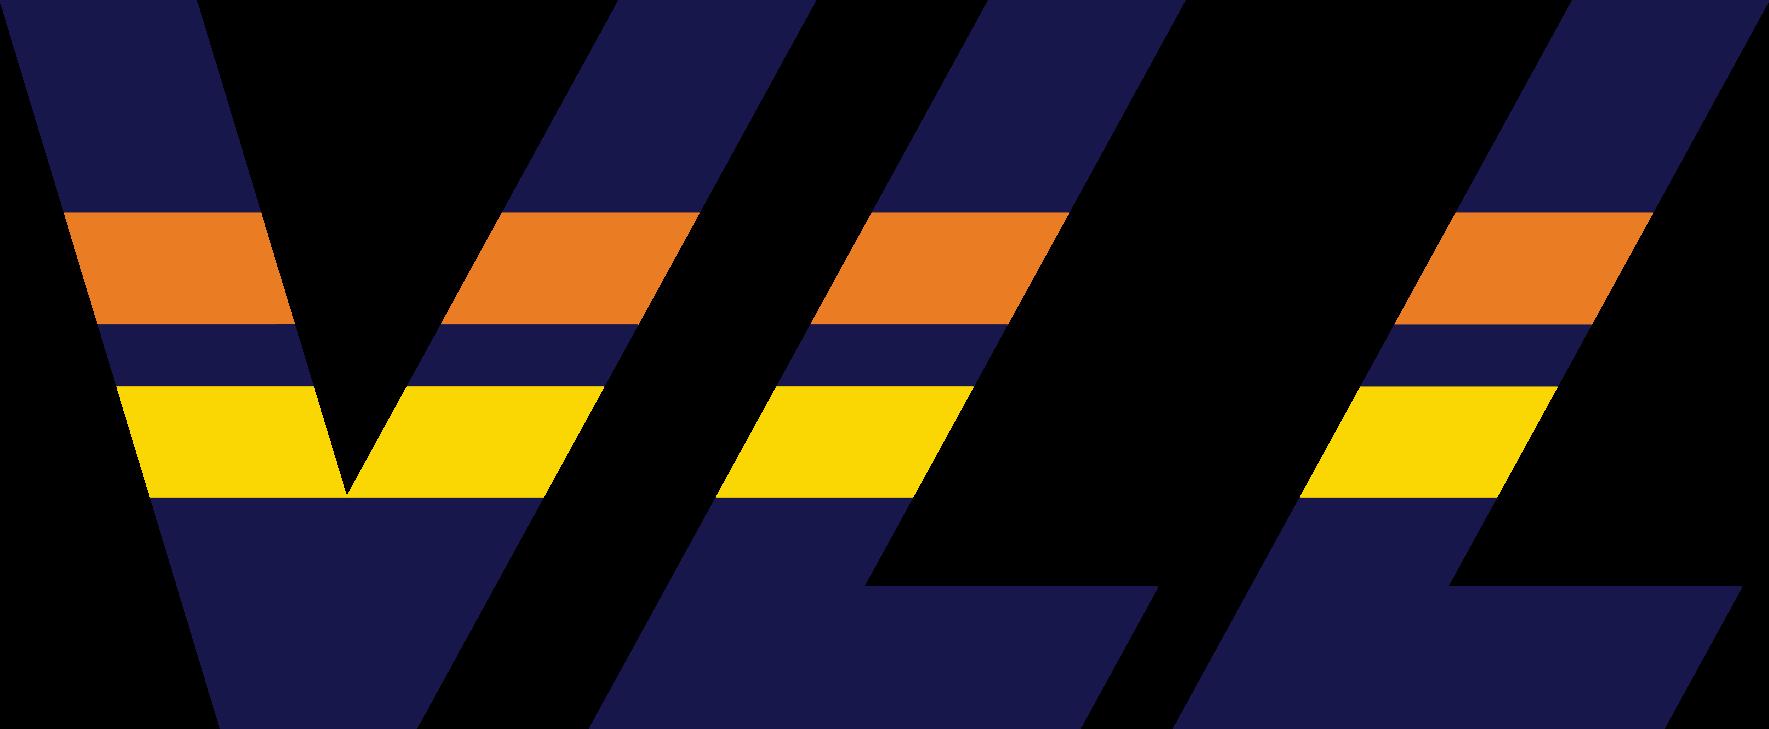 Voyage Logistics Limited